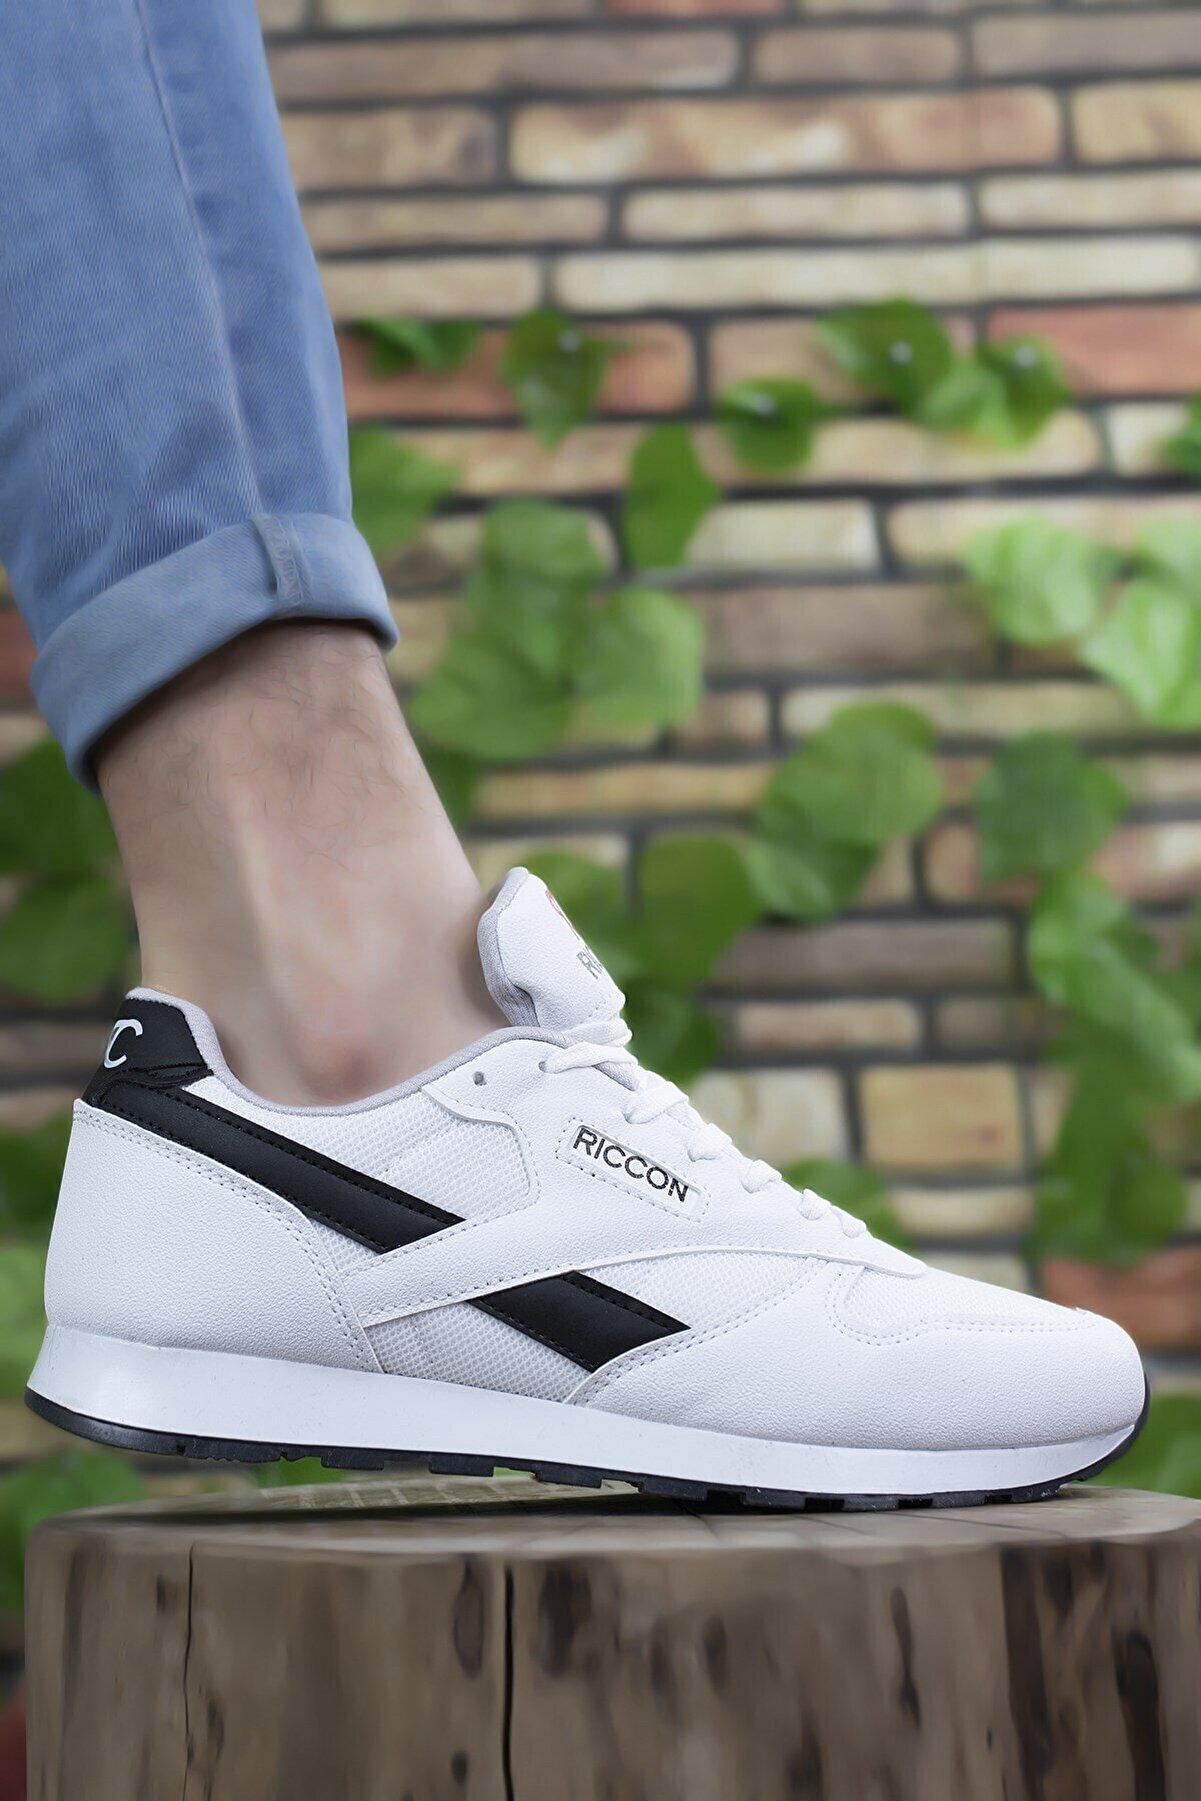 Riccon Beyaz Siyah Unisex Sneaker 0012853